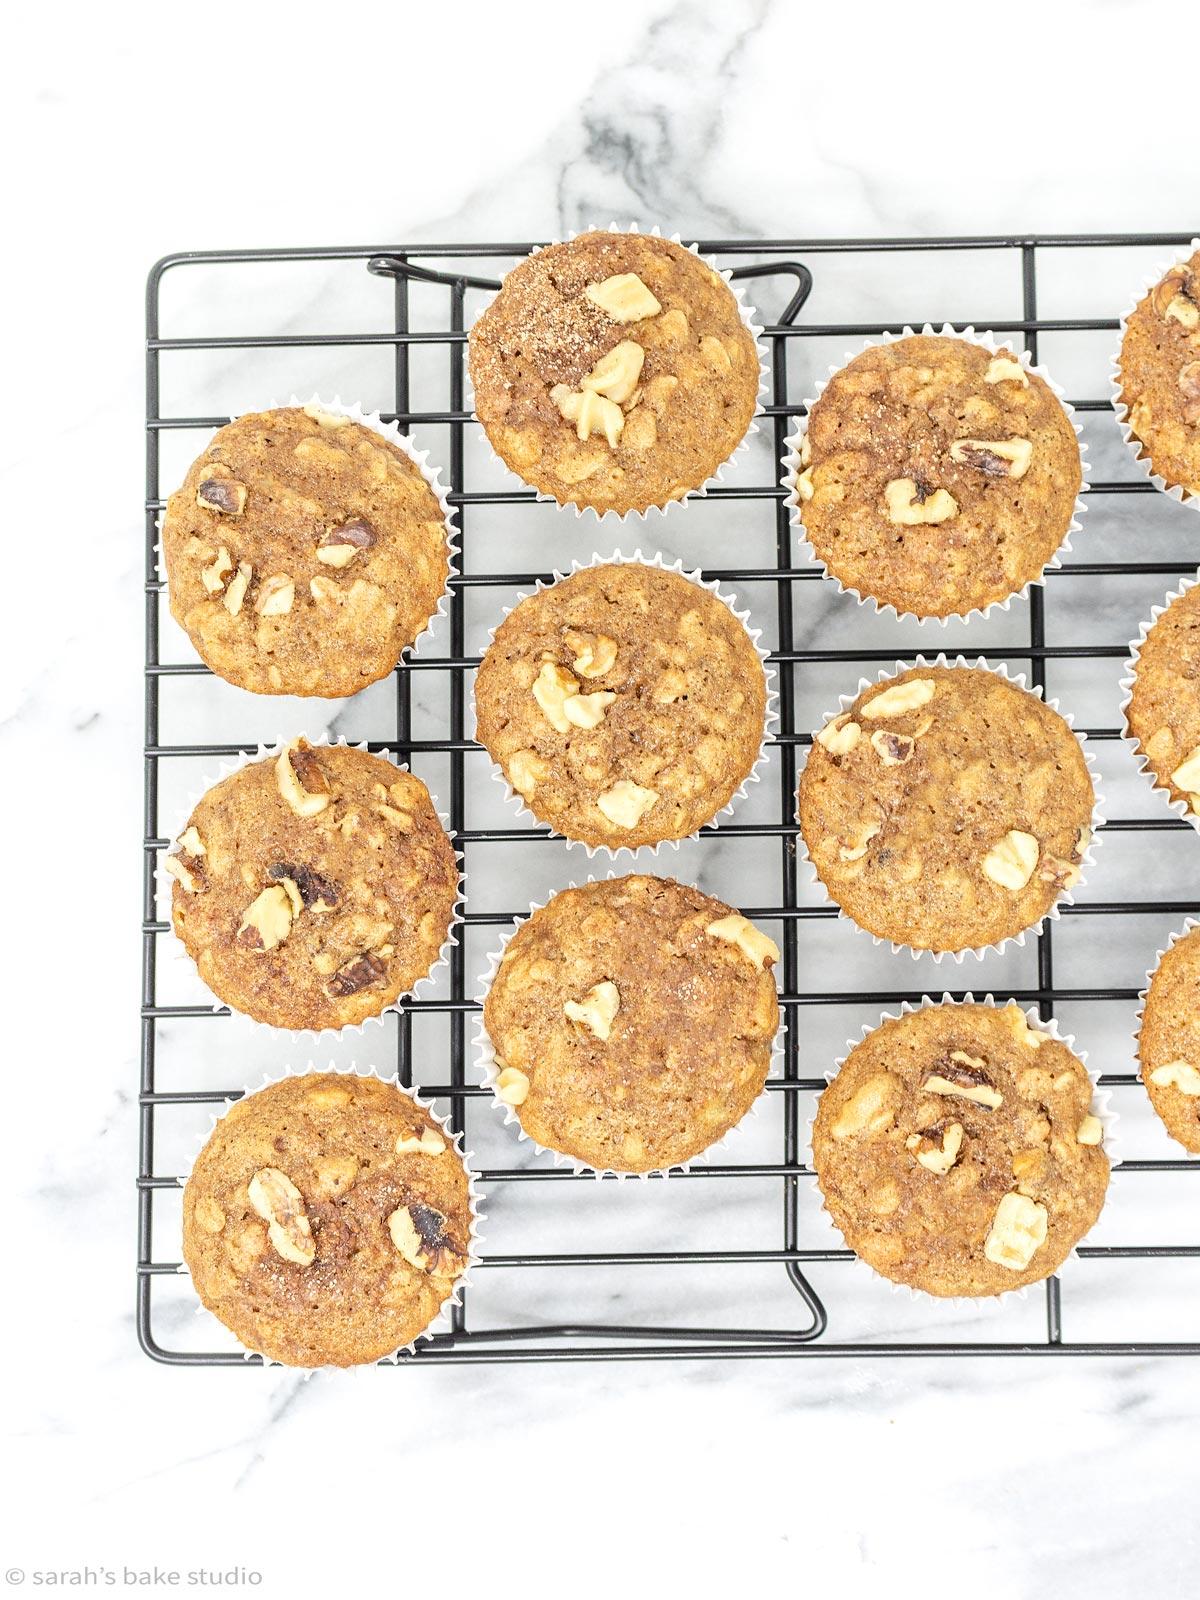 a flat-lay of banana walnut oatmeal muffins on a cooling rack.